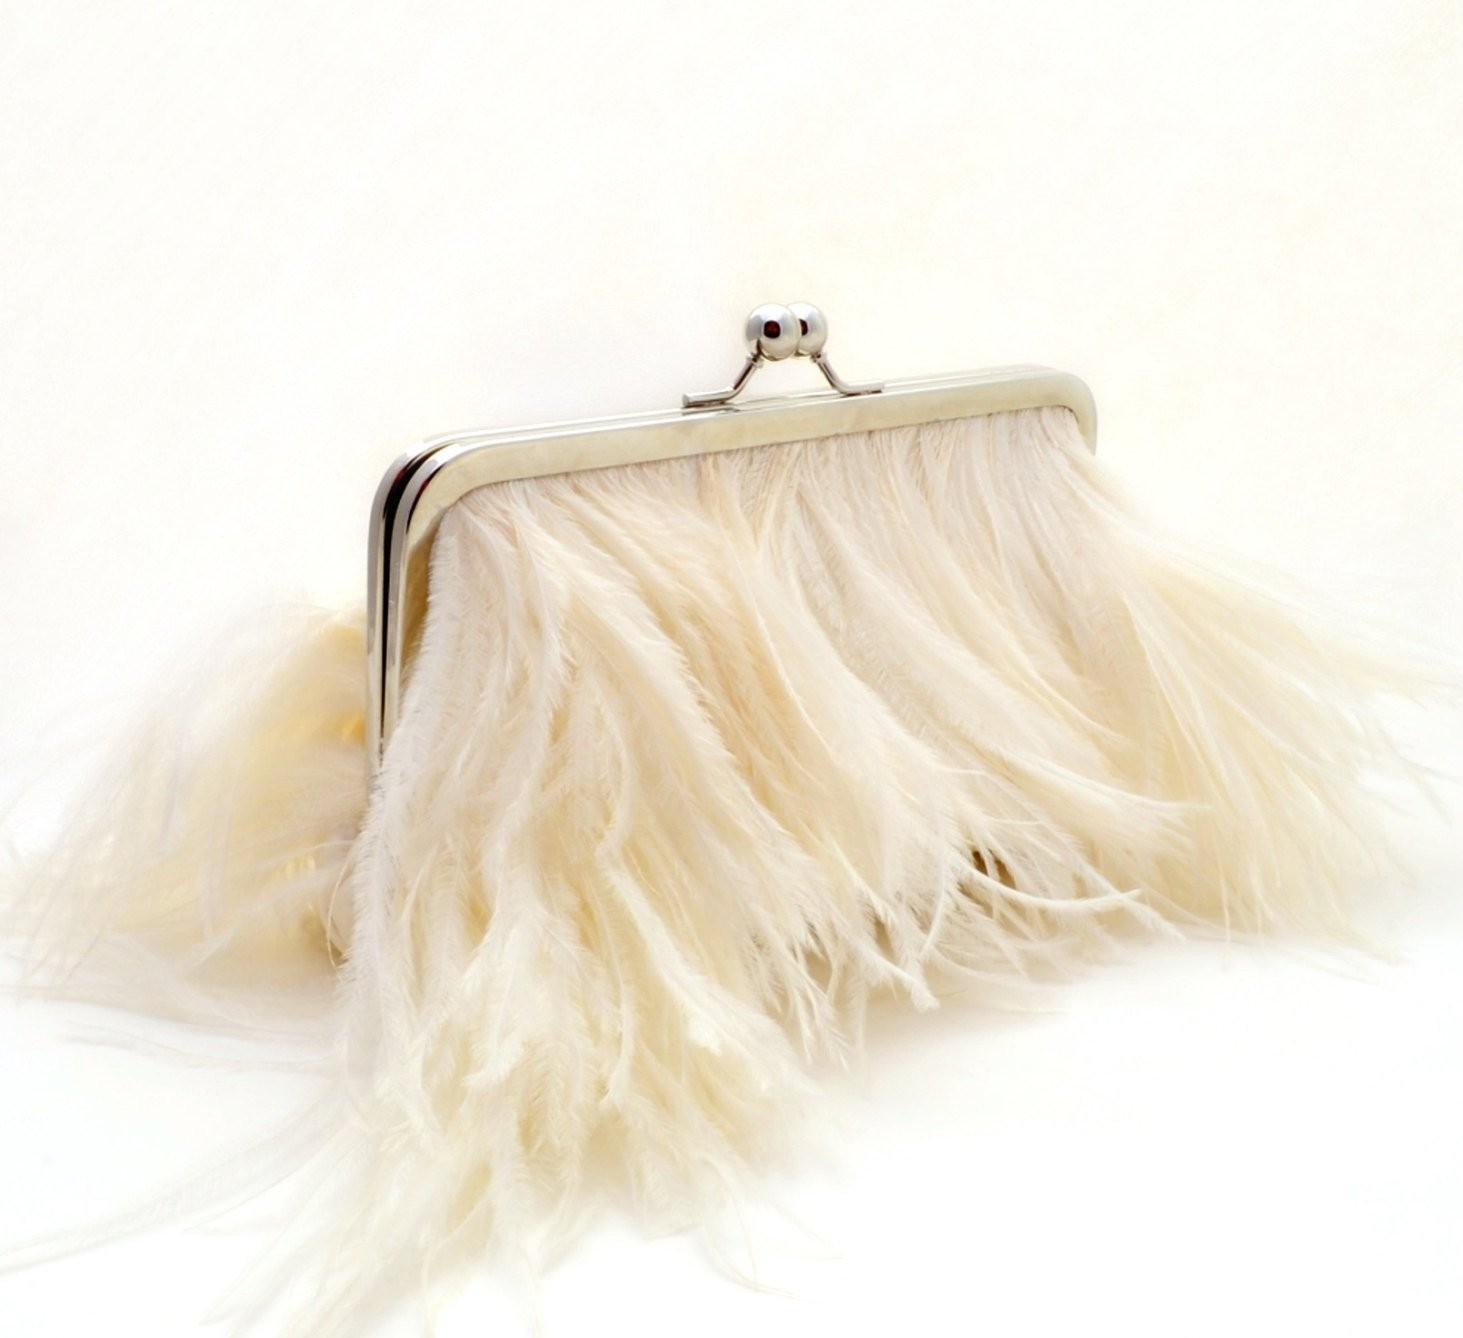 aksessuar-dlya-nevesty Мастер-класс: изящная сумочка с перьями для невесты